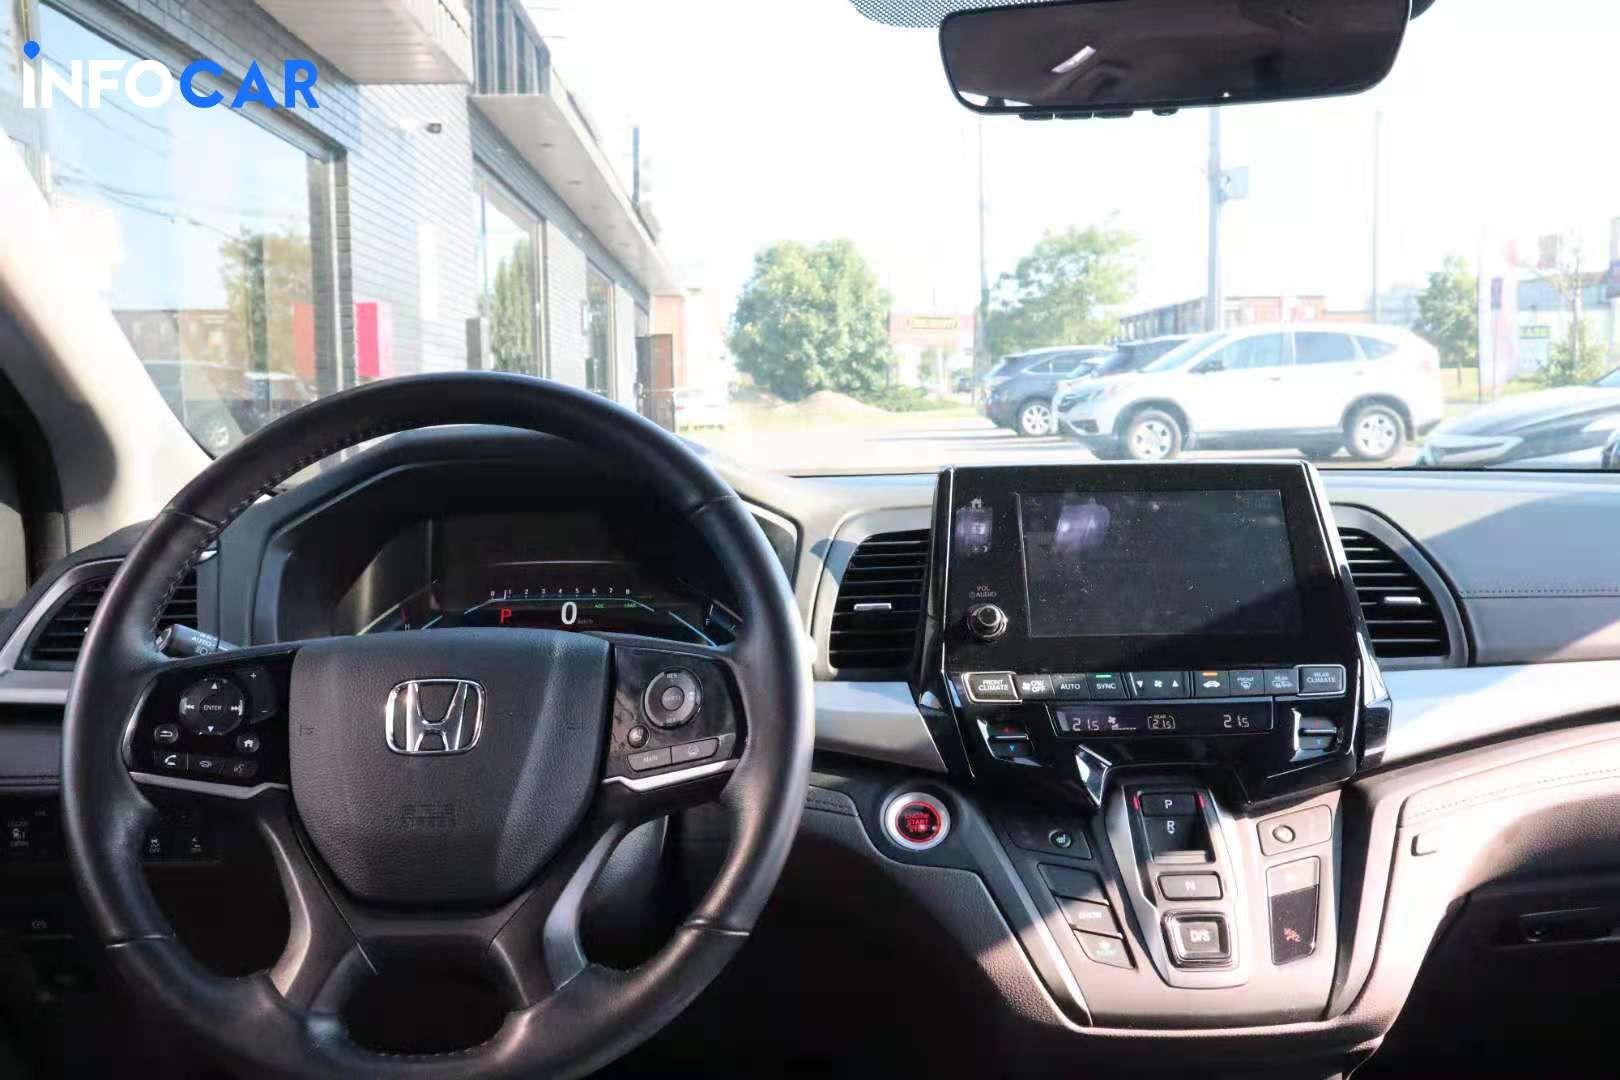 2019 Honda Odyssey EXL - INFOCAR - Toronto's Most Comprehensive New and Used Auto Trading Platform